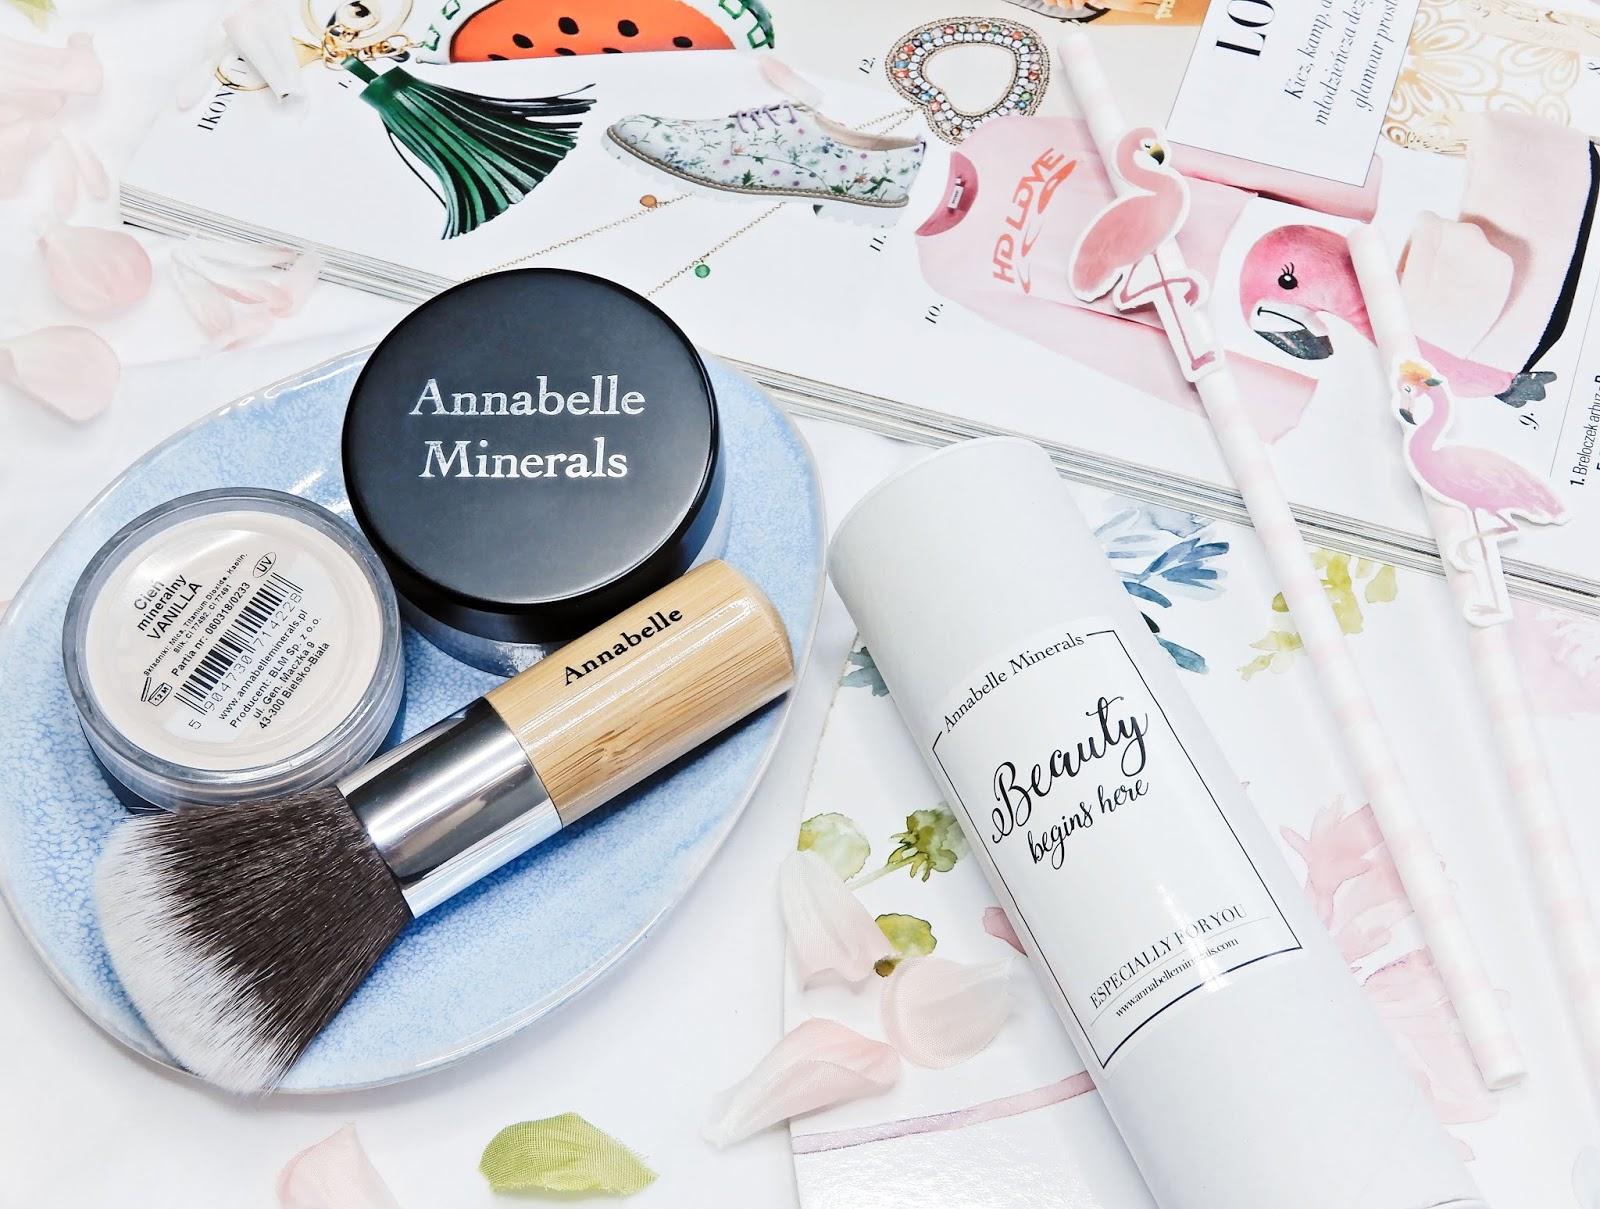 Annabelle Minerals podkład mineralny, Annabelle Minerals pędzel kabuki, Annabelle Minerals cień vanilla, Annabelle Minerals,